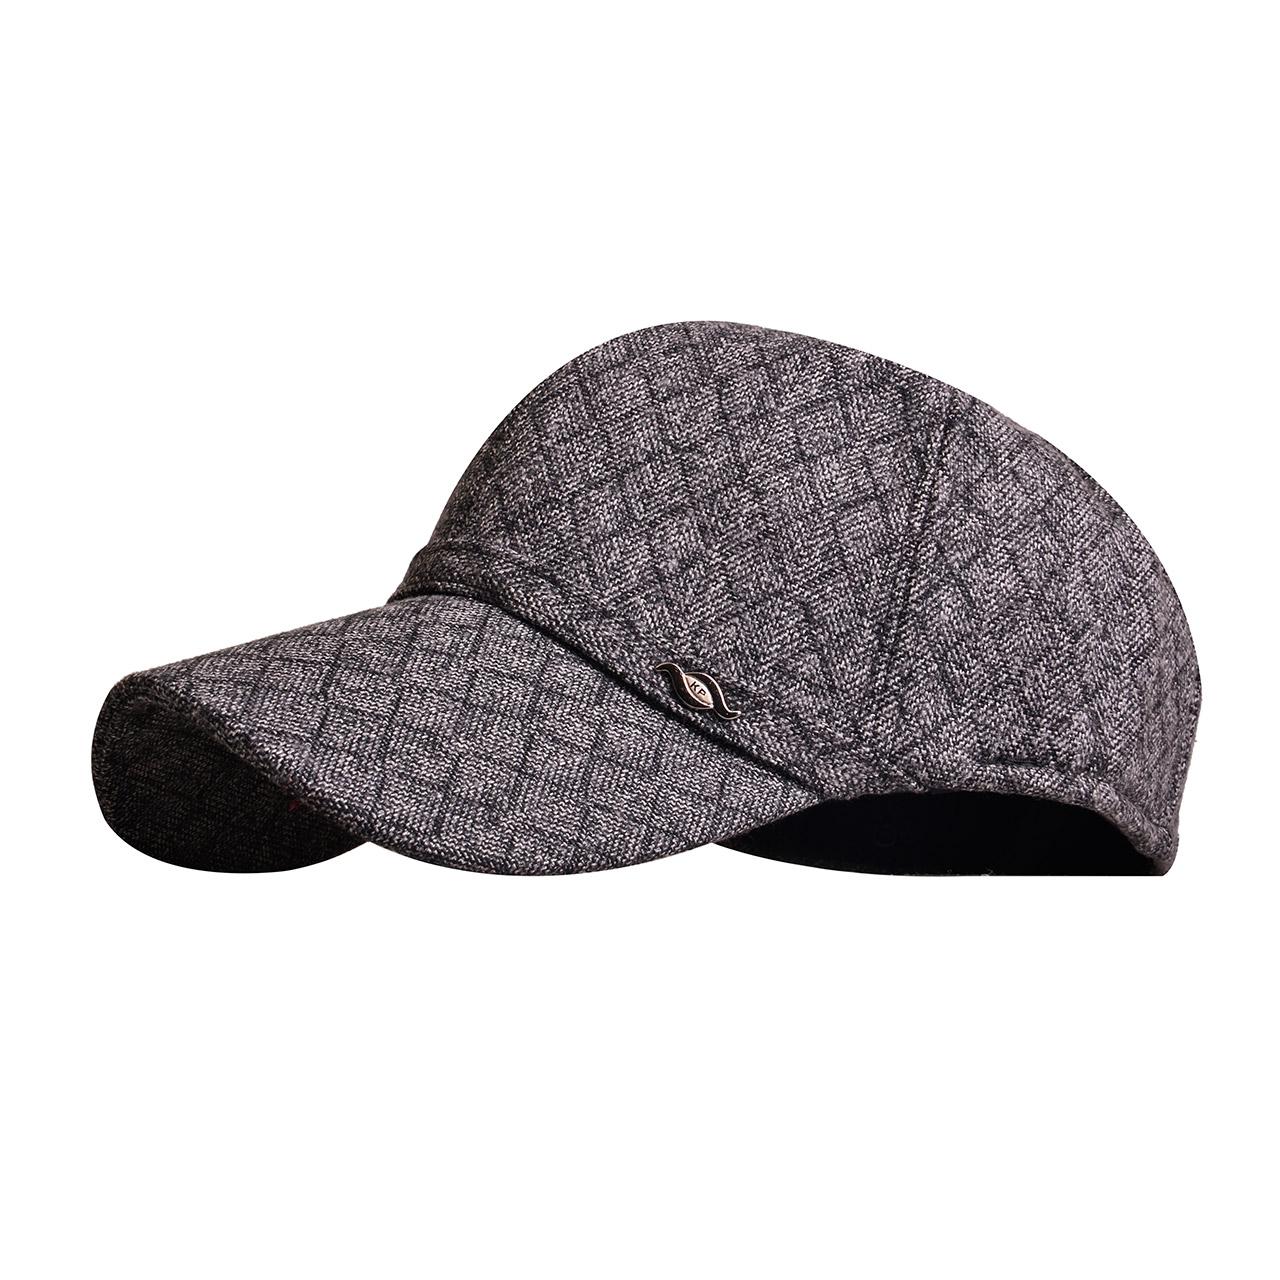 قیمت کلاه کپ مدل PZ52